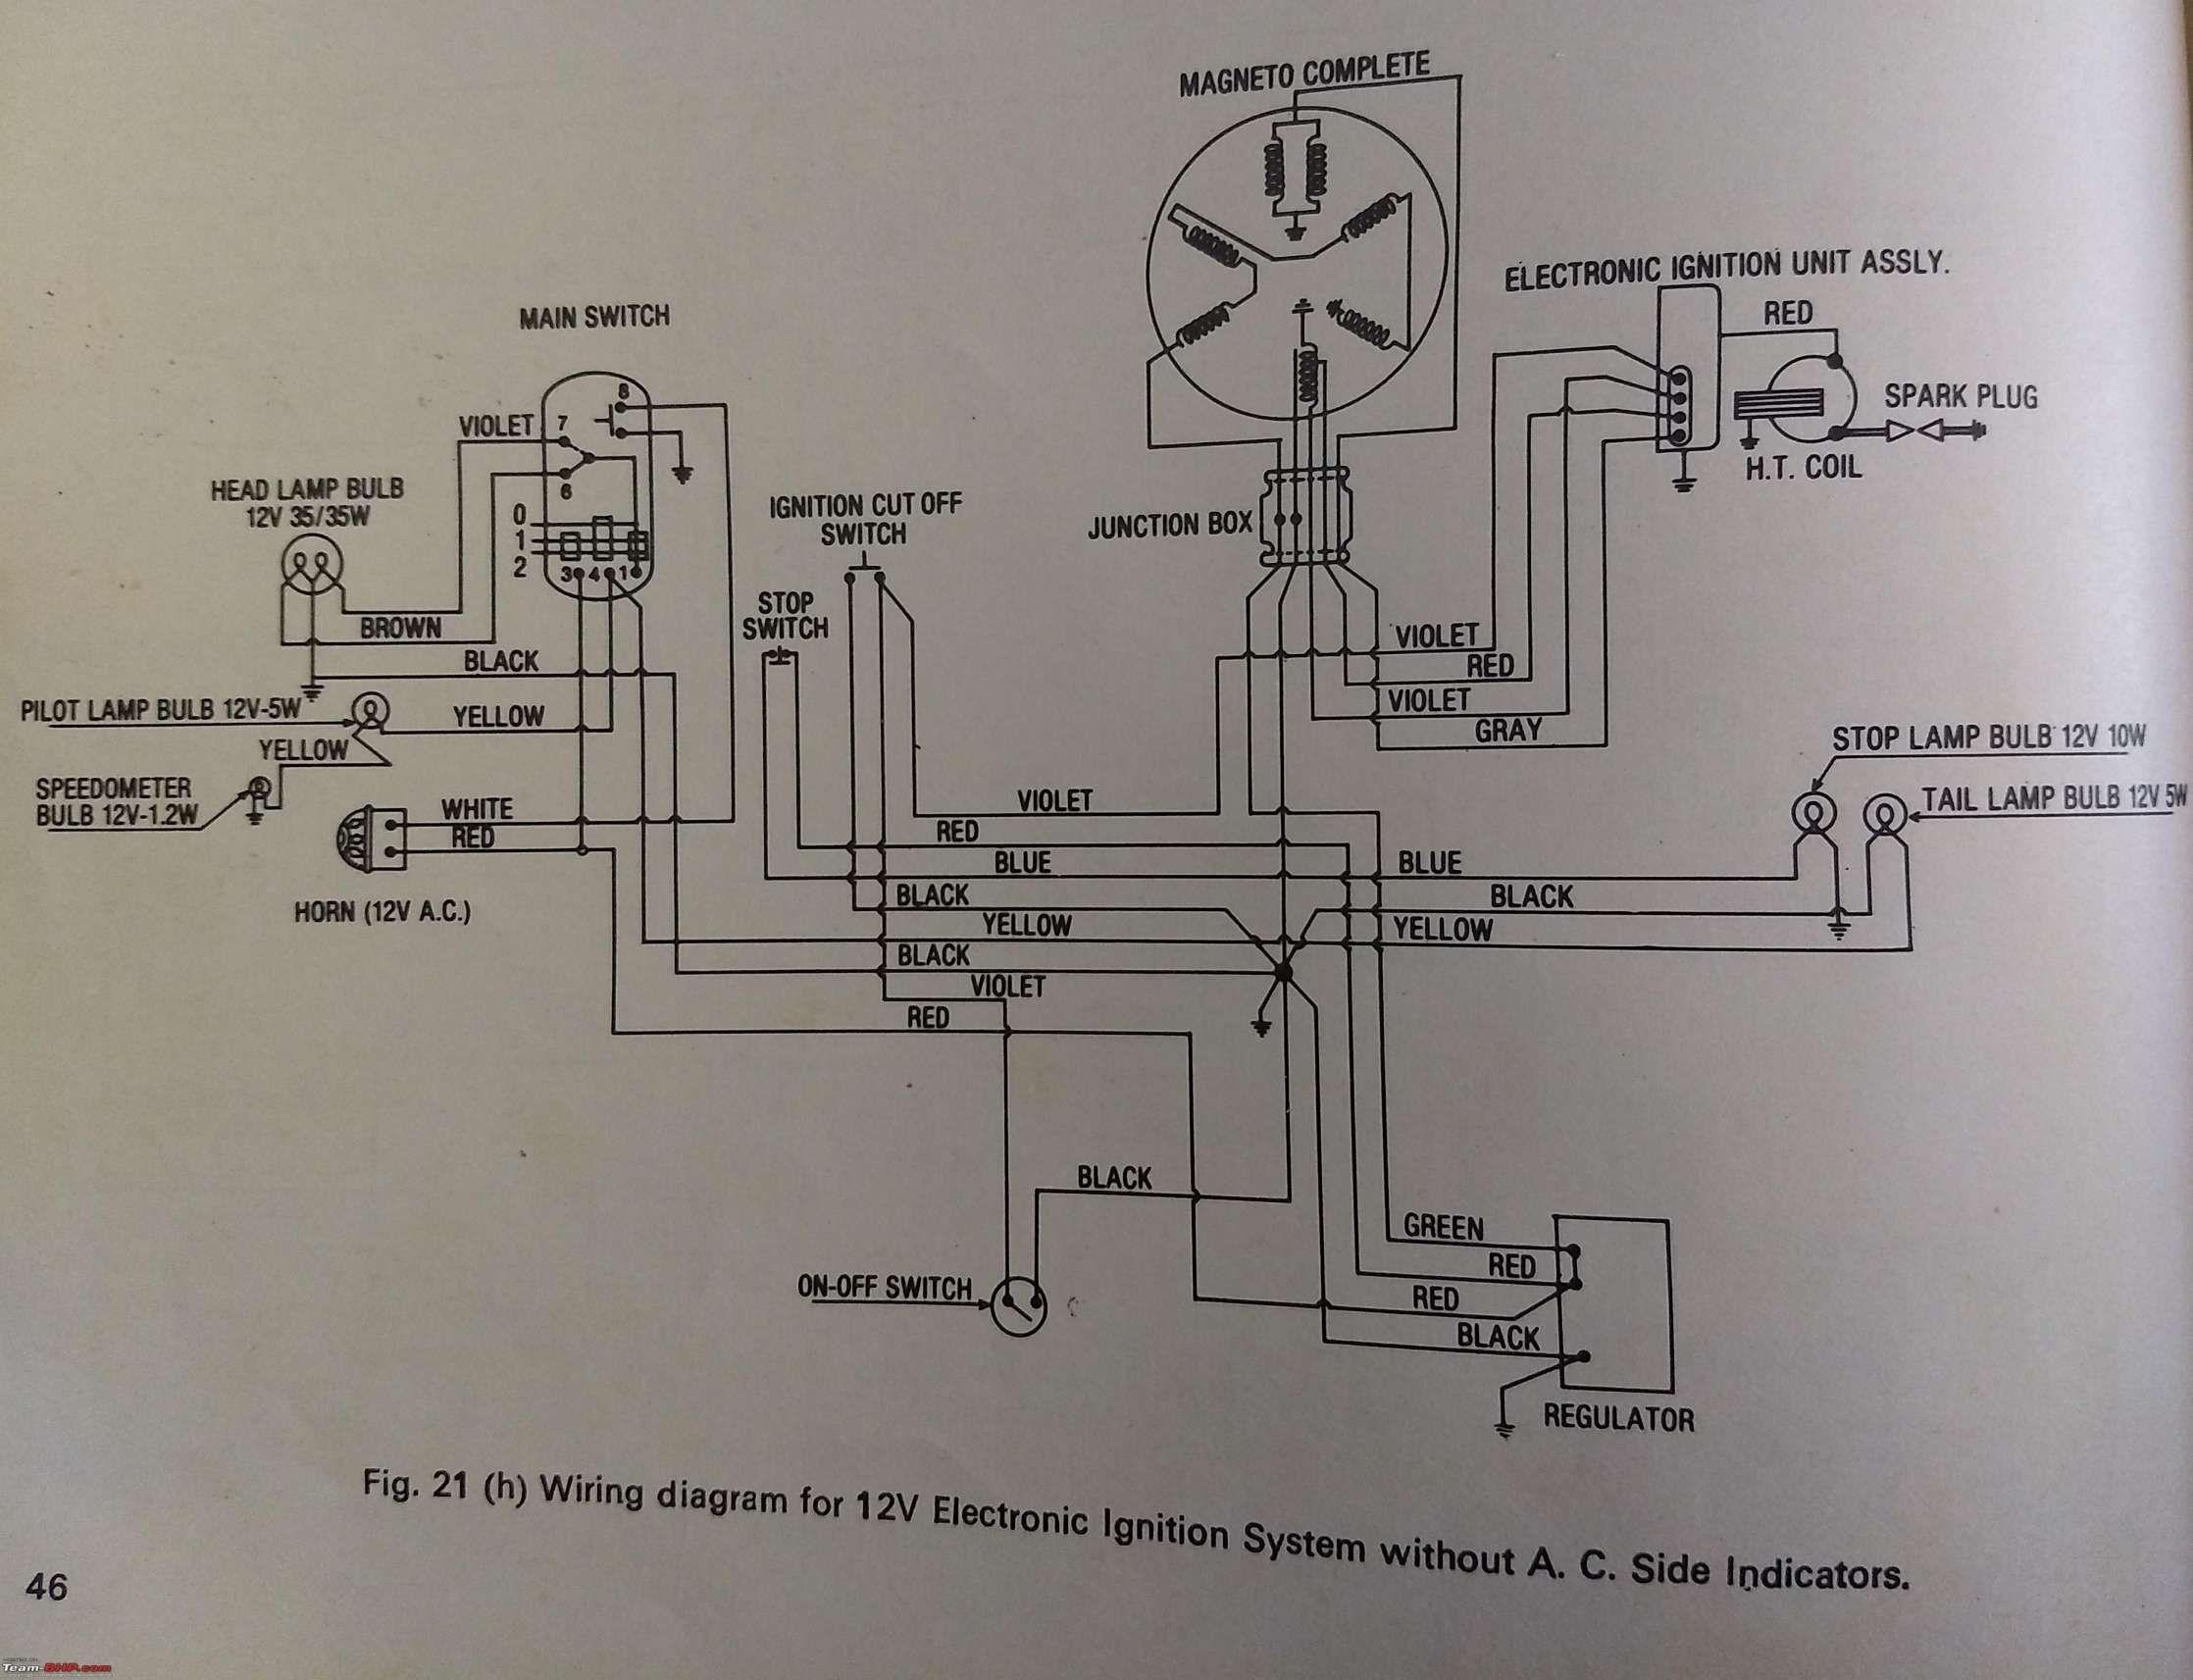 16 Rusi Motorcycle Wiring Diagram Motorcycle Diagram Wiringg Net Electrical Diagram Electrical Wiring Diagram Diagram